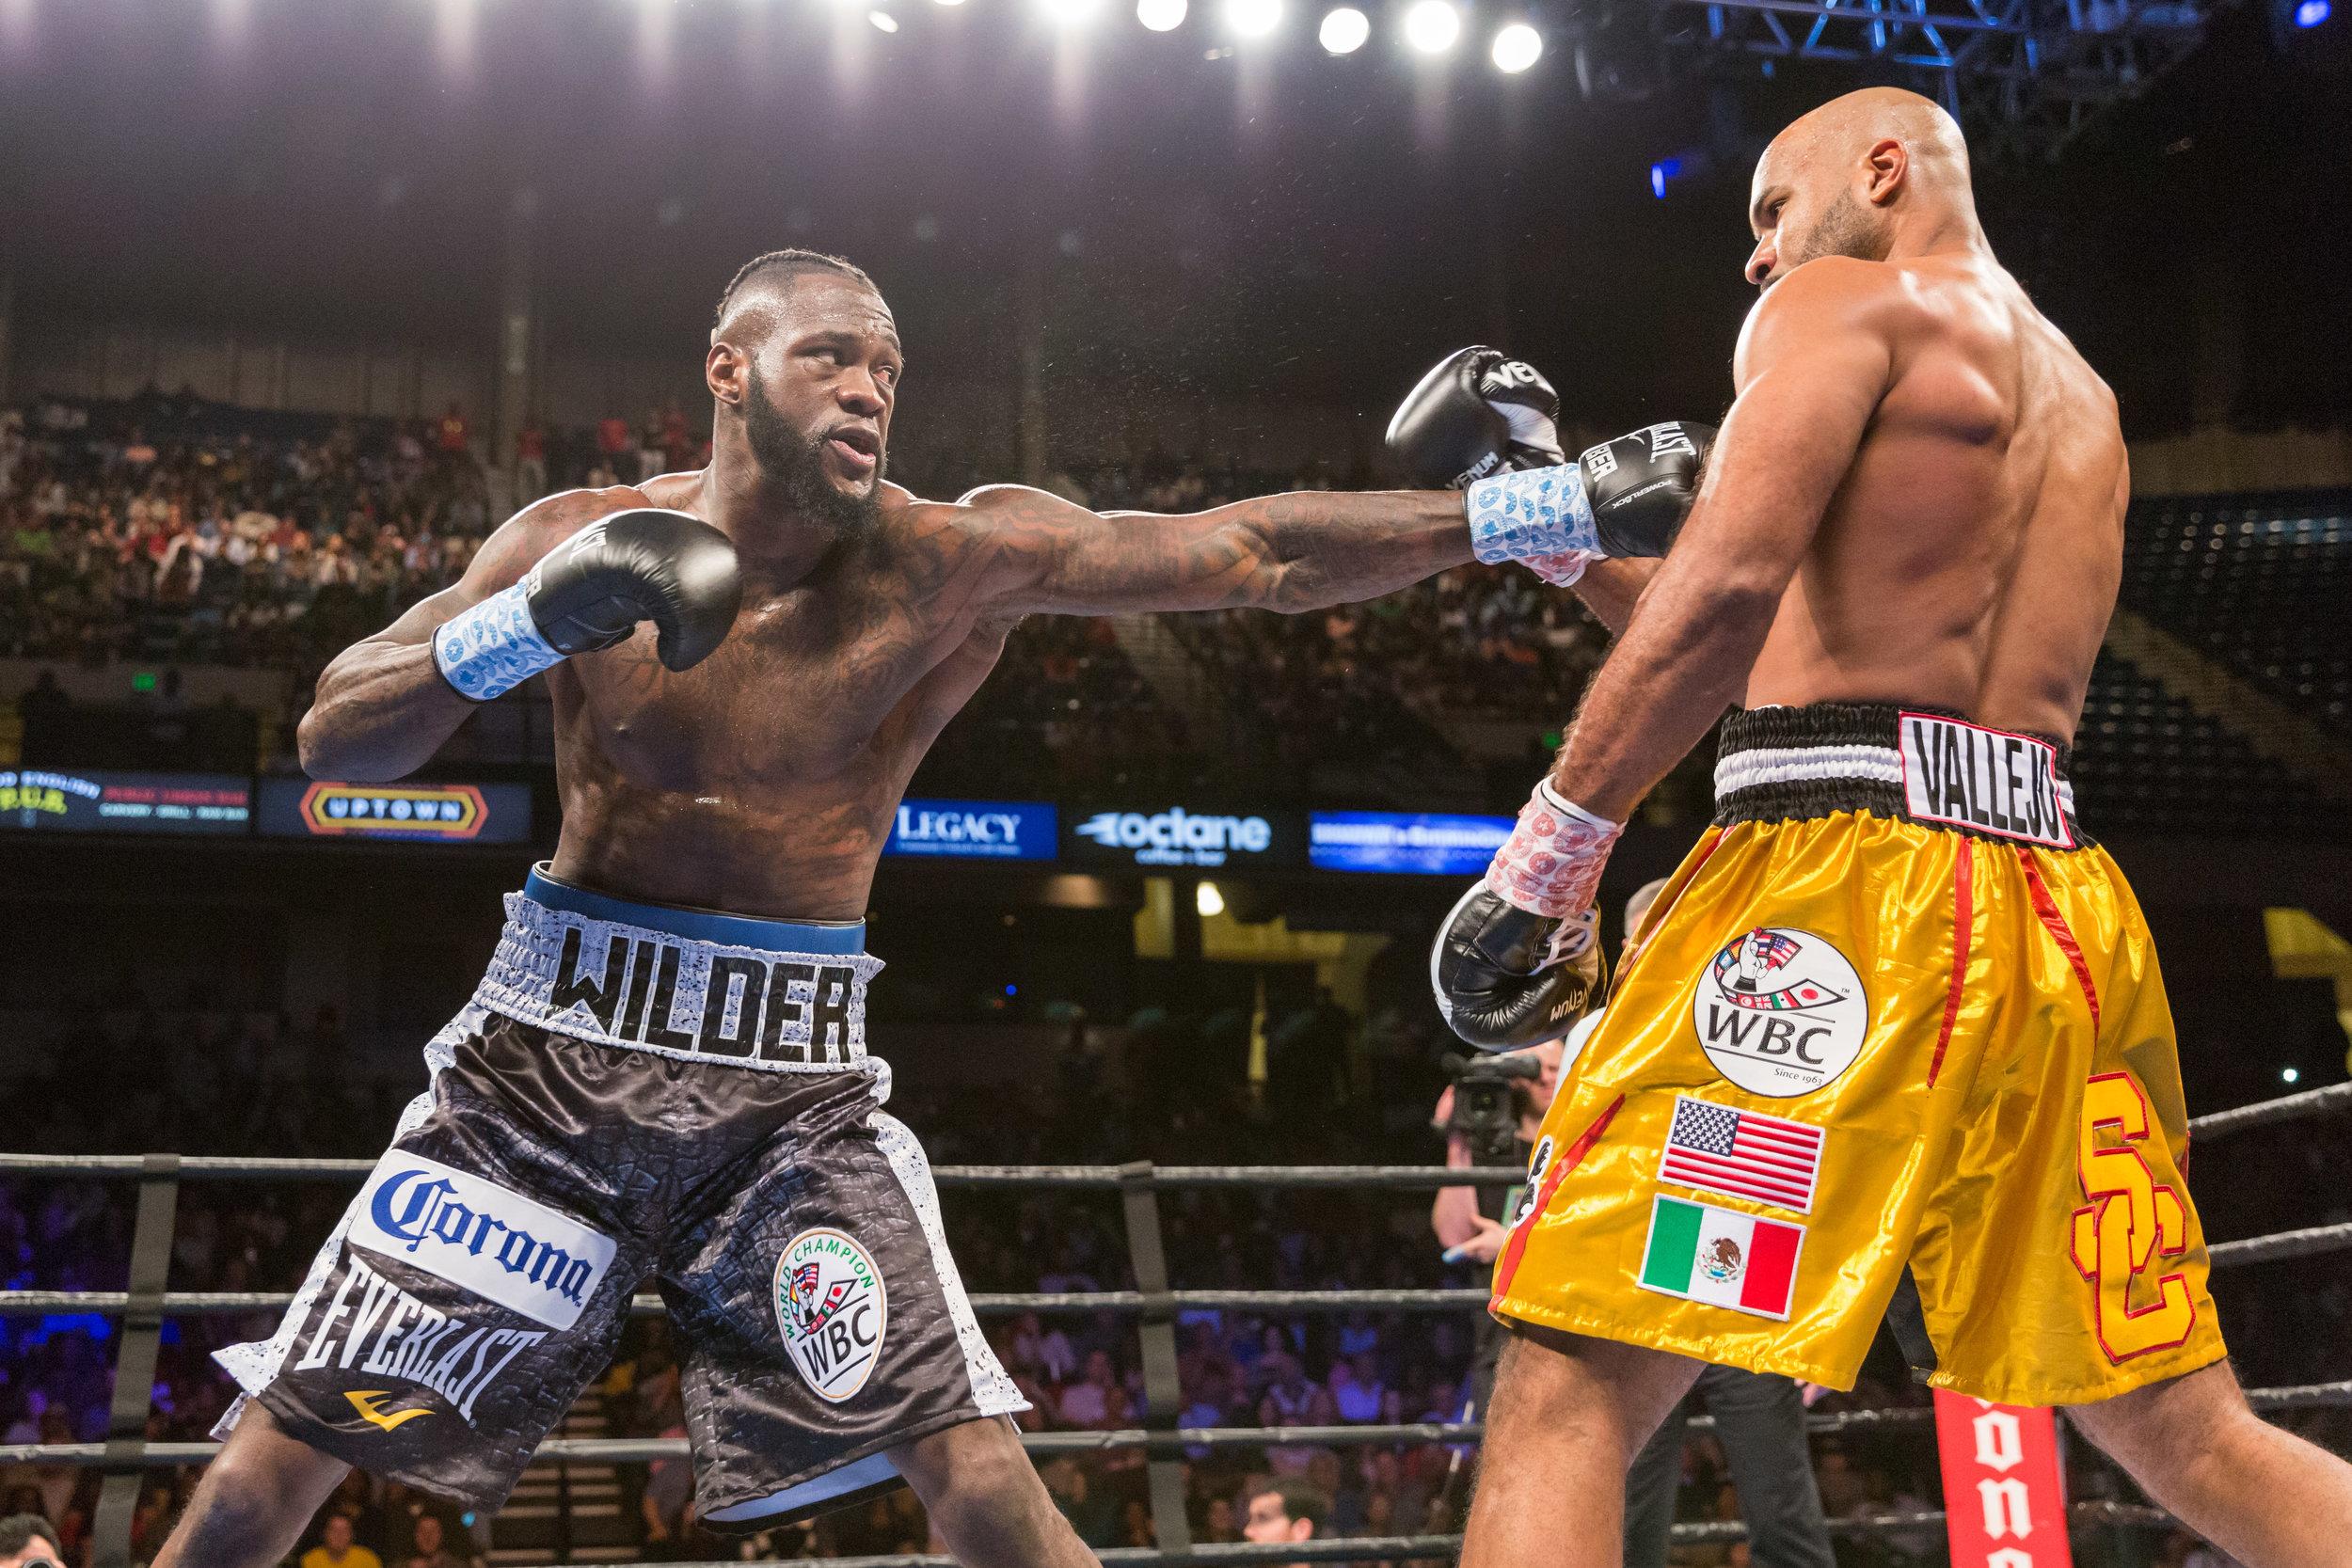 Deontay Wilder vs Gerald Washington - February 25_ 2017_02_25_2017_Fight_Ryan Hafey _ Premier Boxing Champions6.jpg